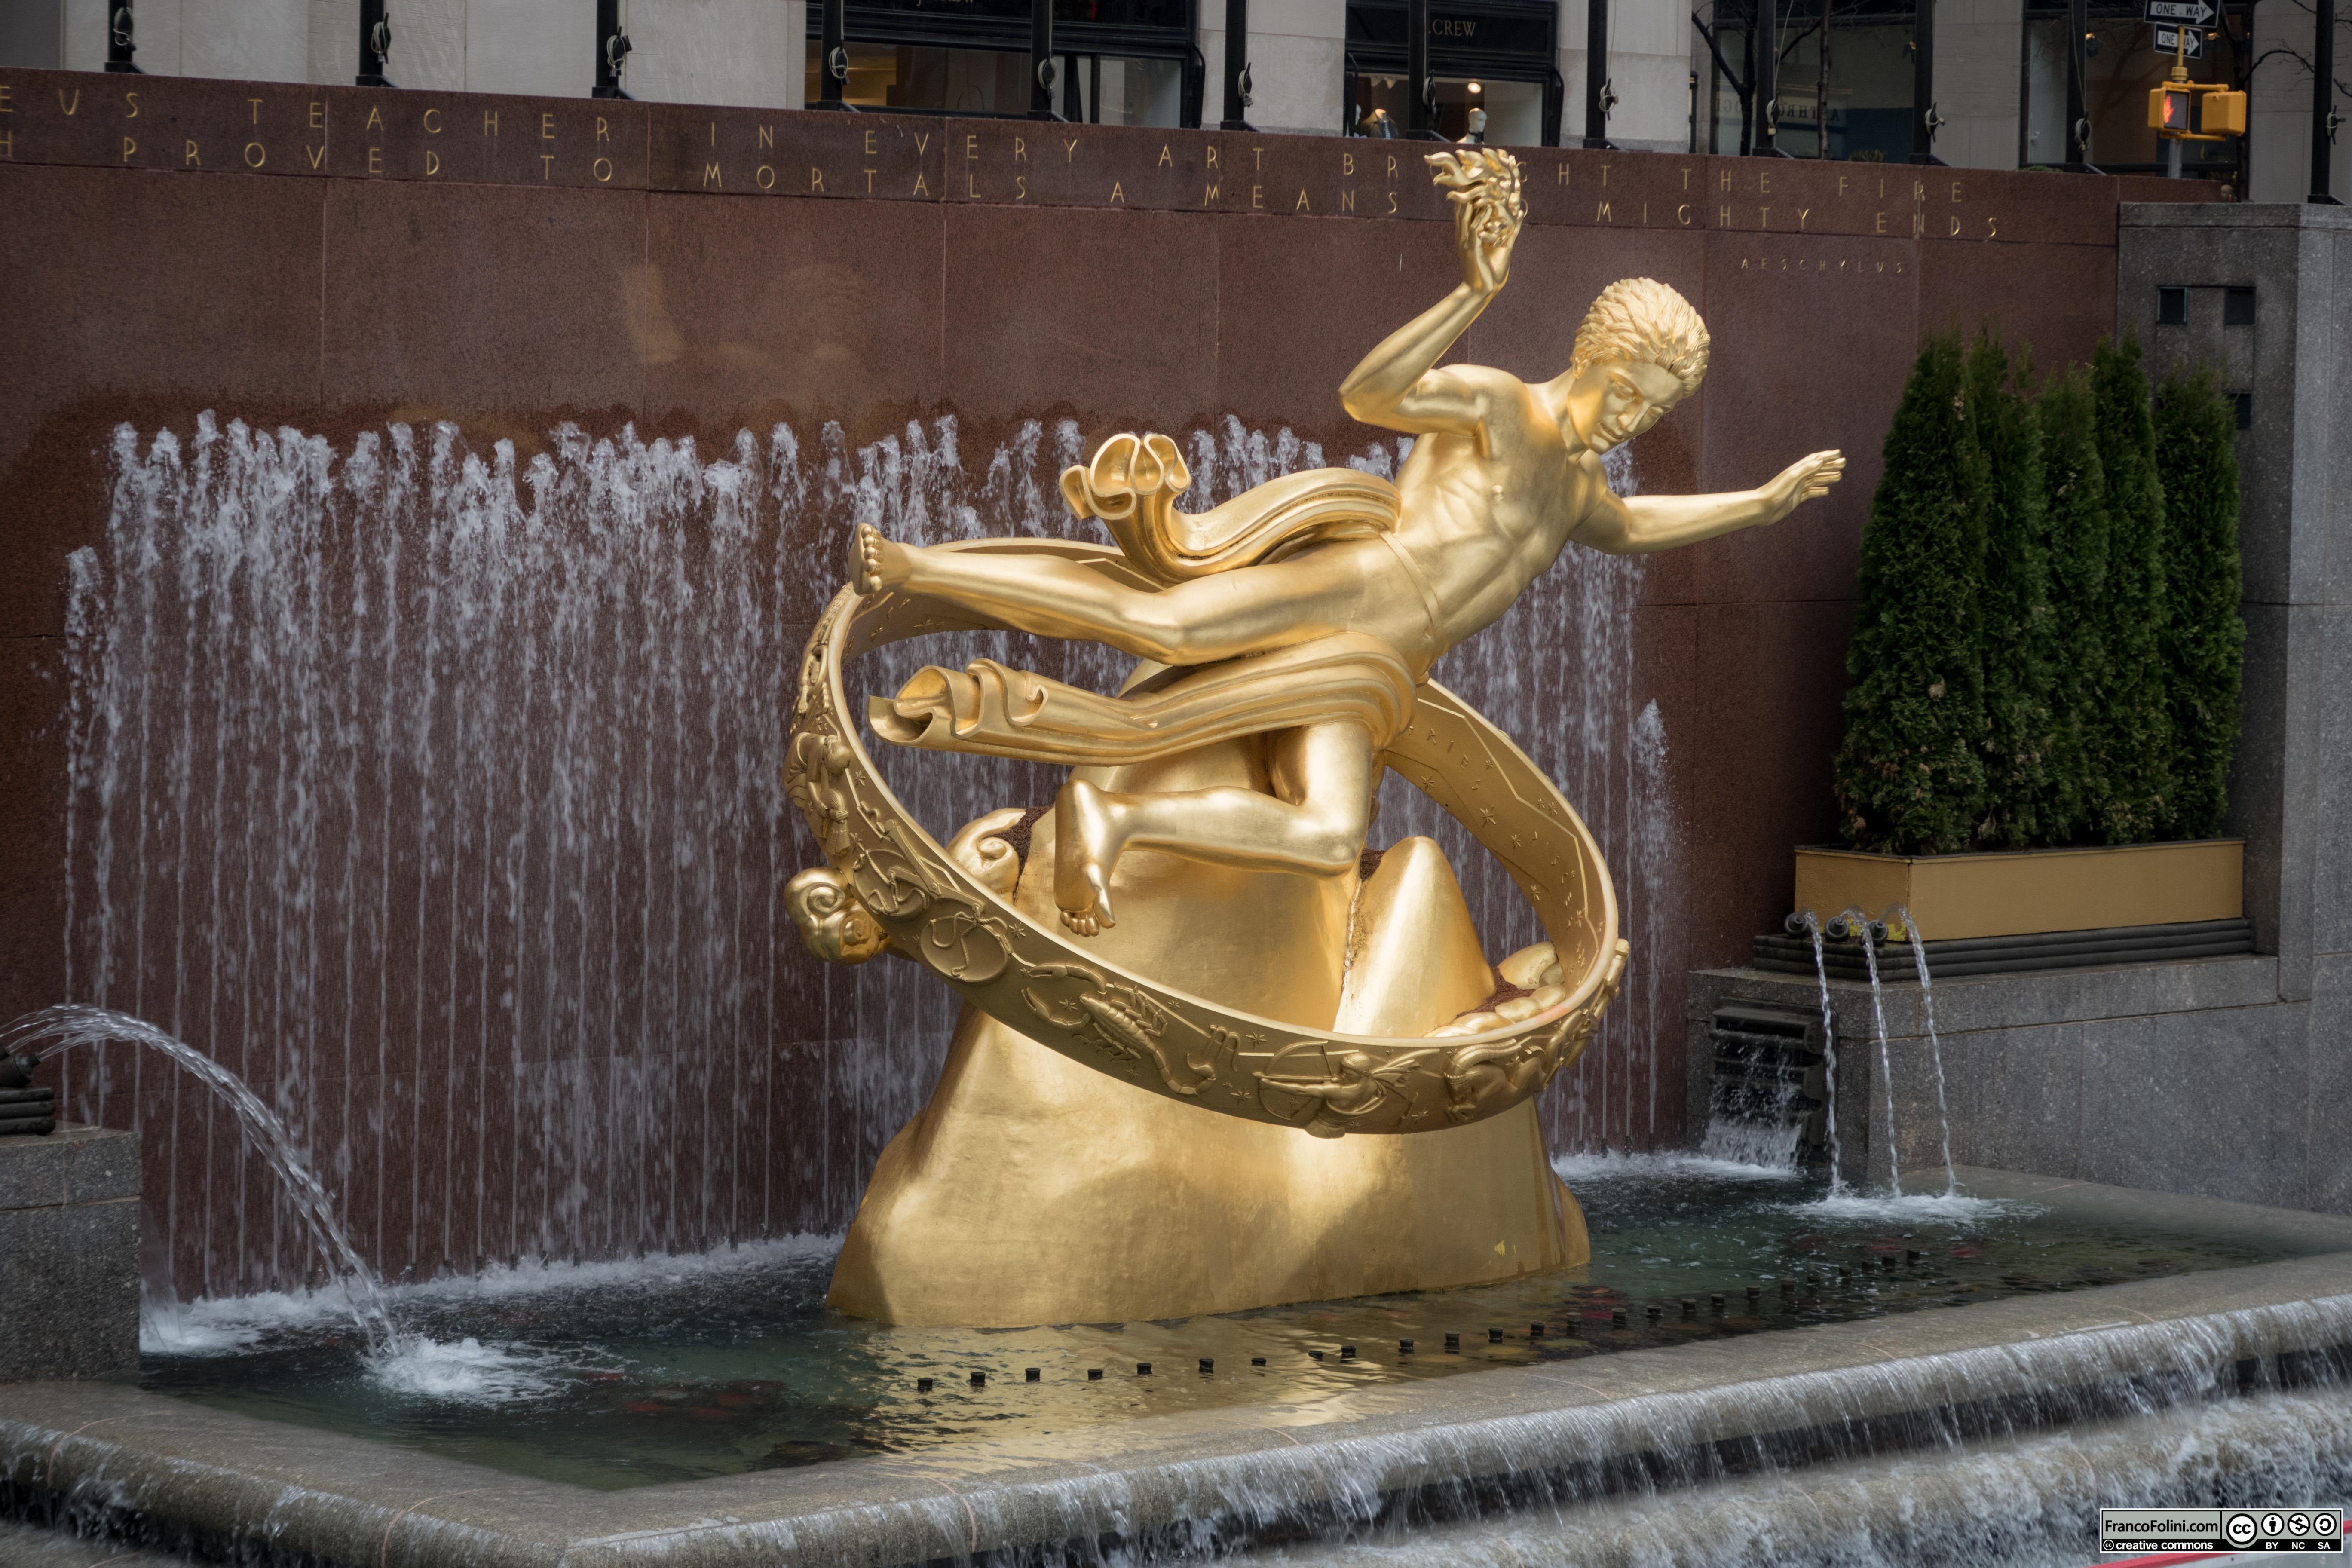 Prometheus statue at the Rockefeller Center in Manhattan, New York City